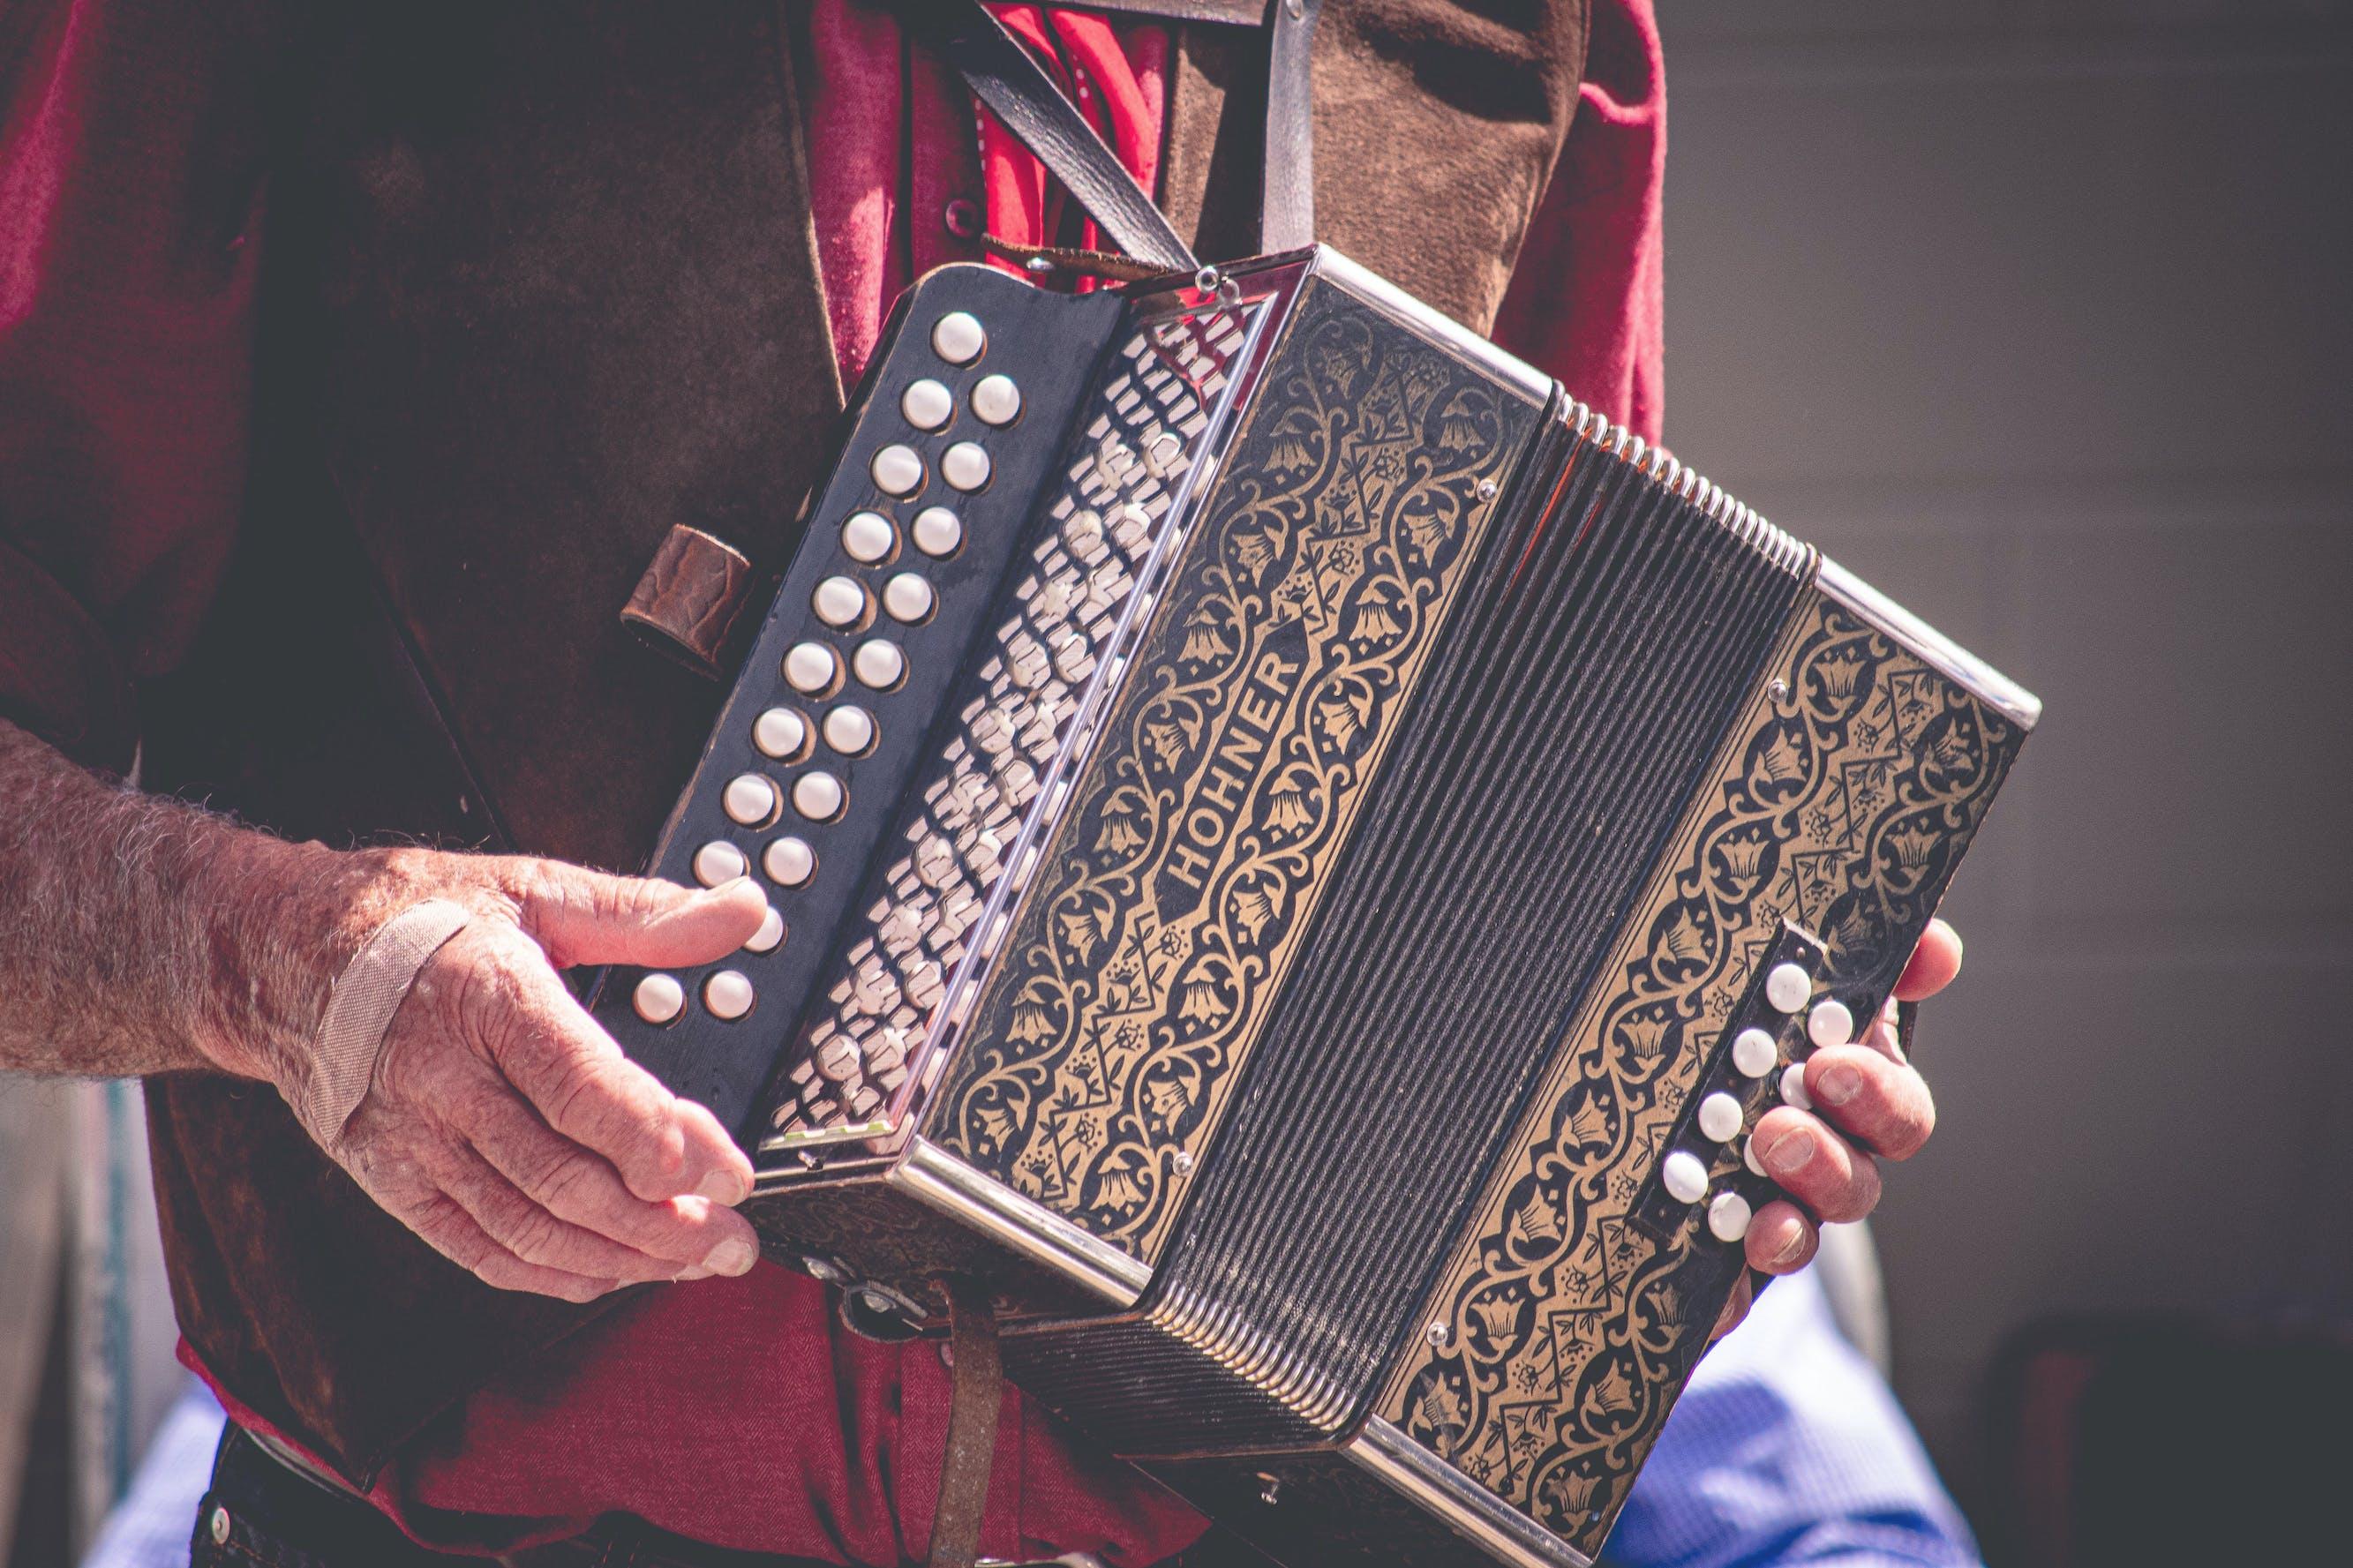 Geannuleerd – Presentatie & debat: European Agenda for Music (NL)